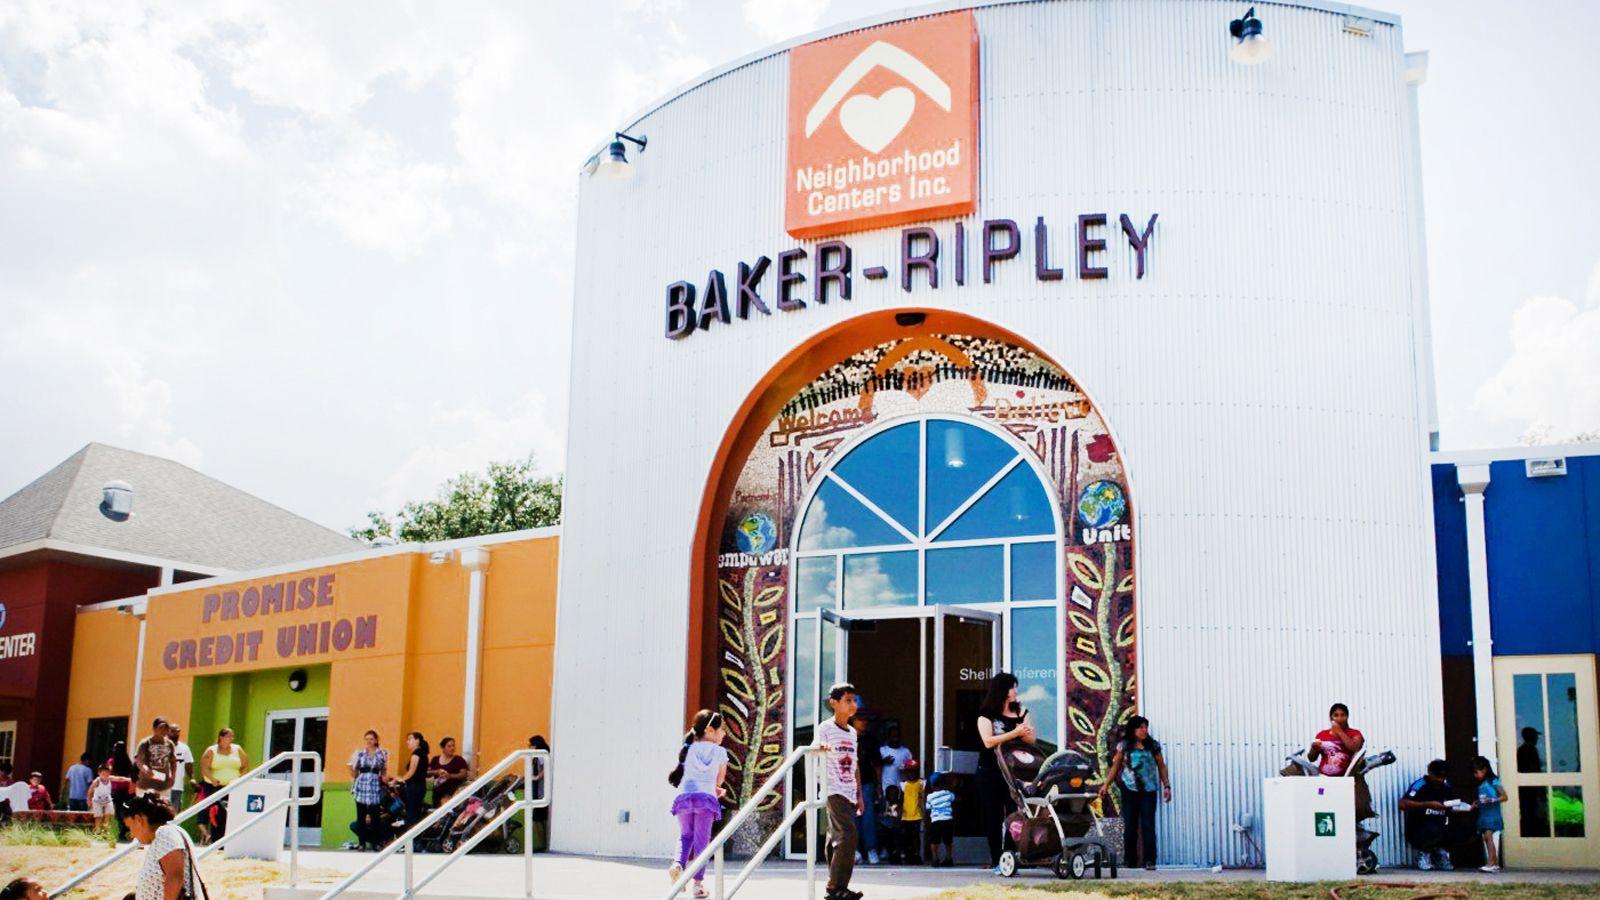 Legacy Community Health - Baker-Ripley